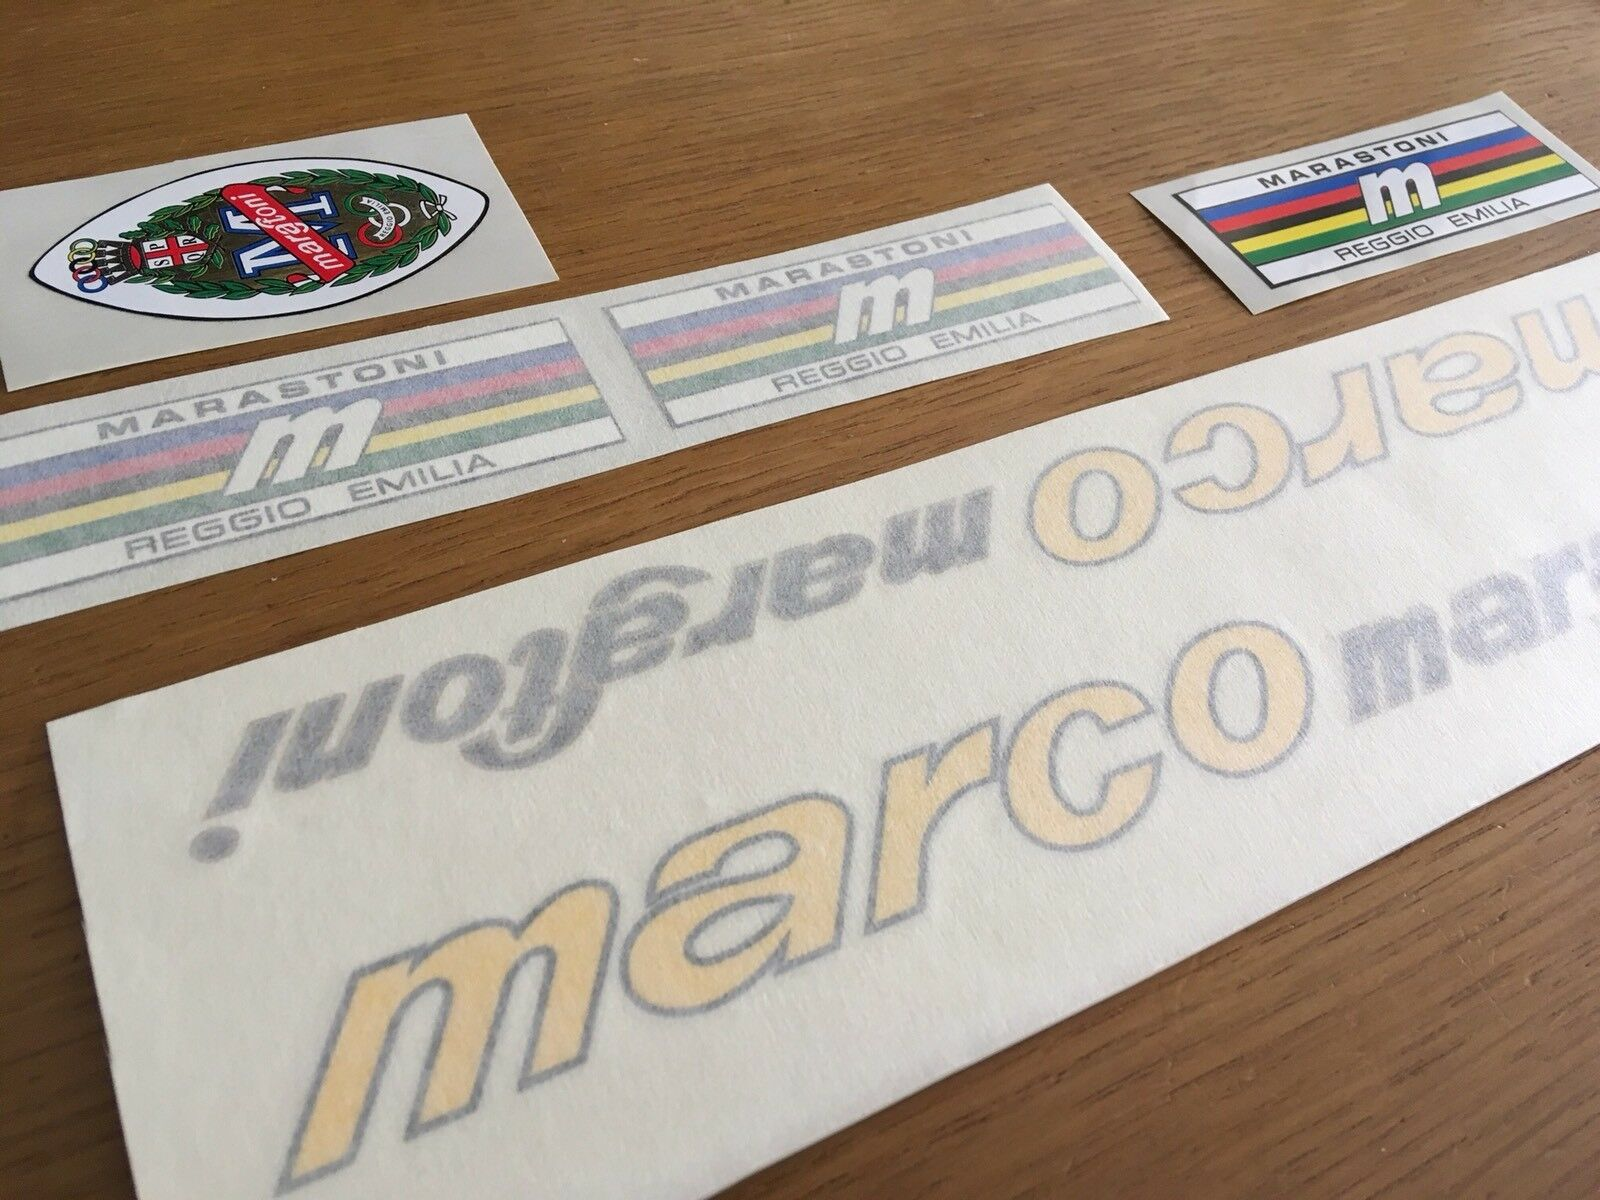 Marco  Marastoni Licinio Reggio Emilia decal adesivi bici  Set  enjoy saving 30-50% off